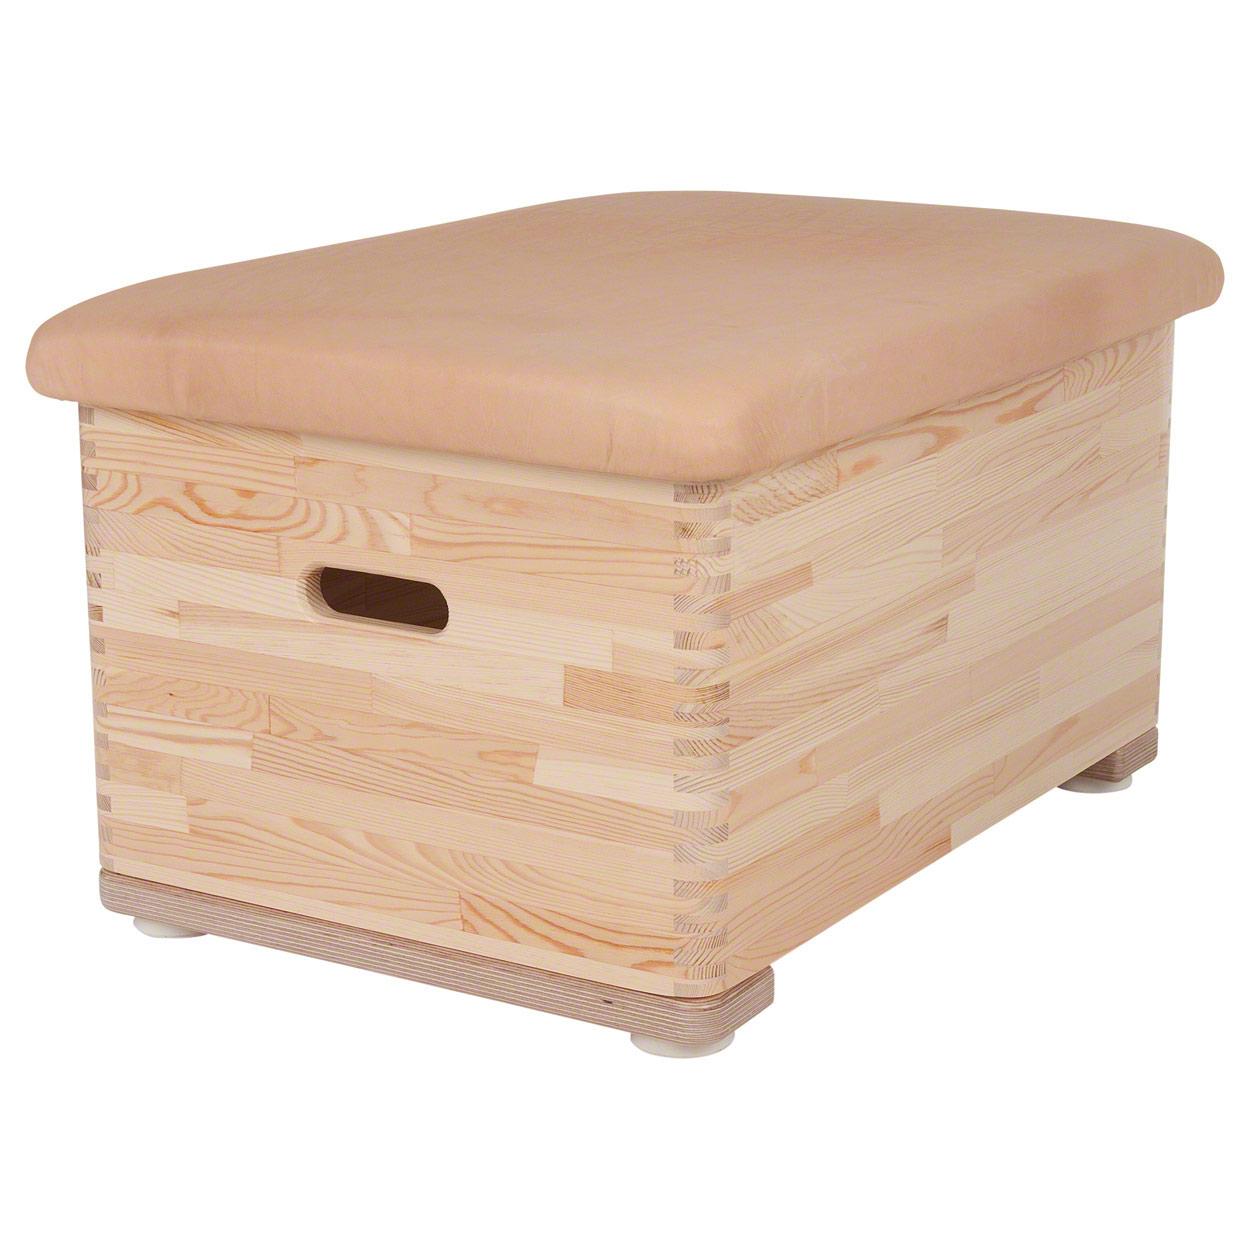 sprungkasten turnkasten sprungbock turnbock springbock springkasten klein ebay. Black Bedroom Furniture Sets. Home Design Ideas